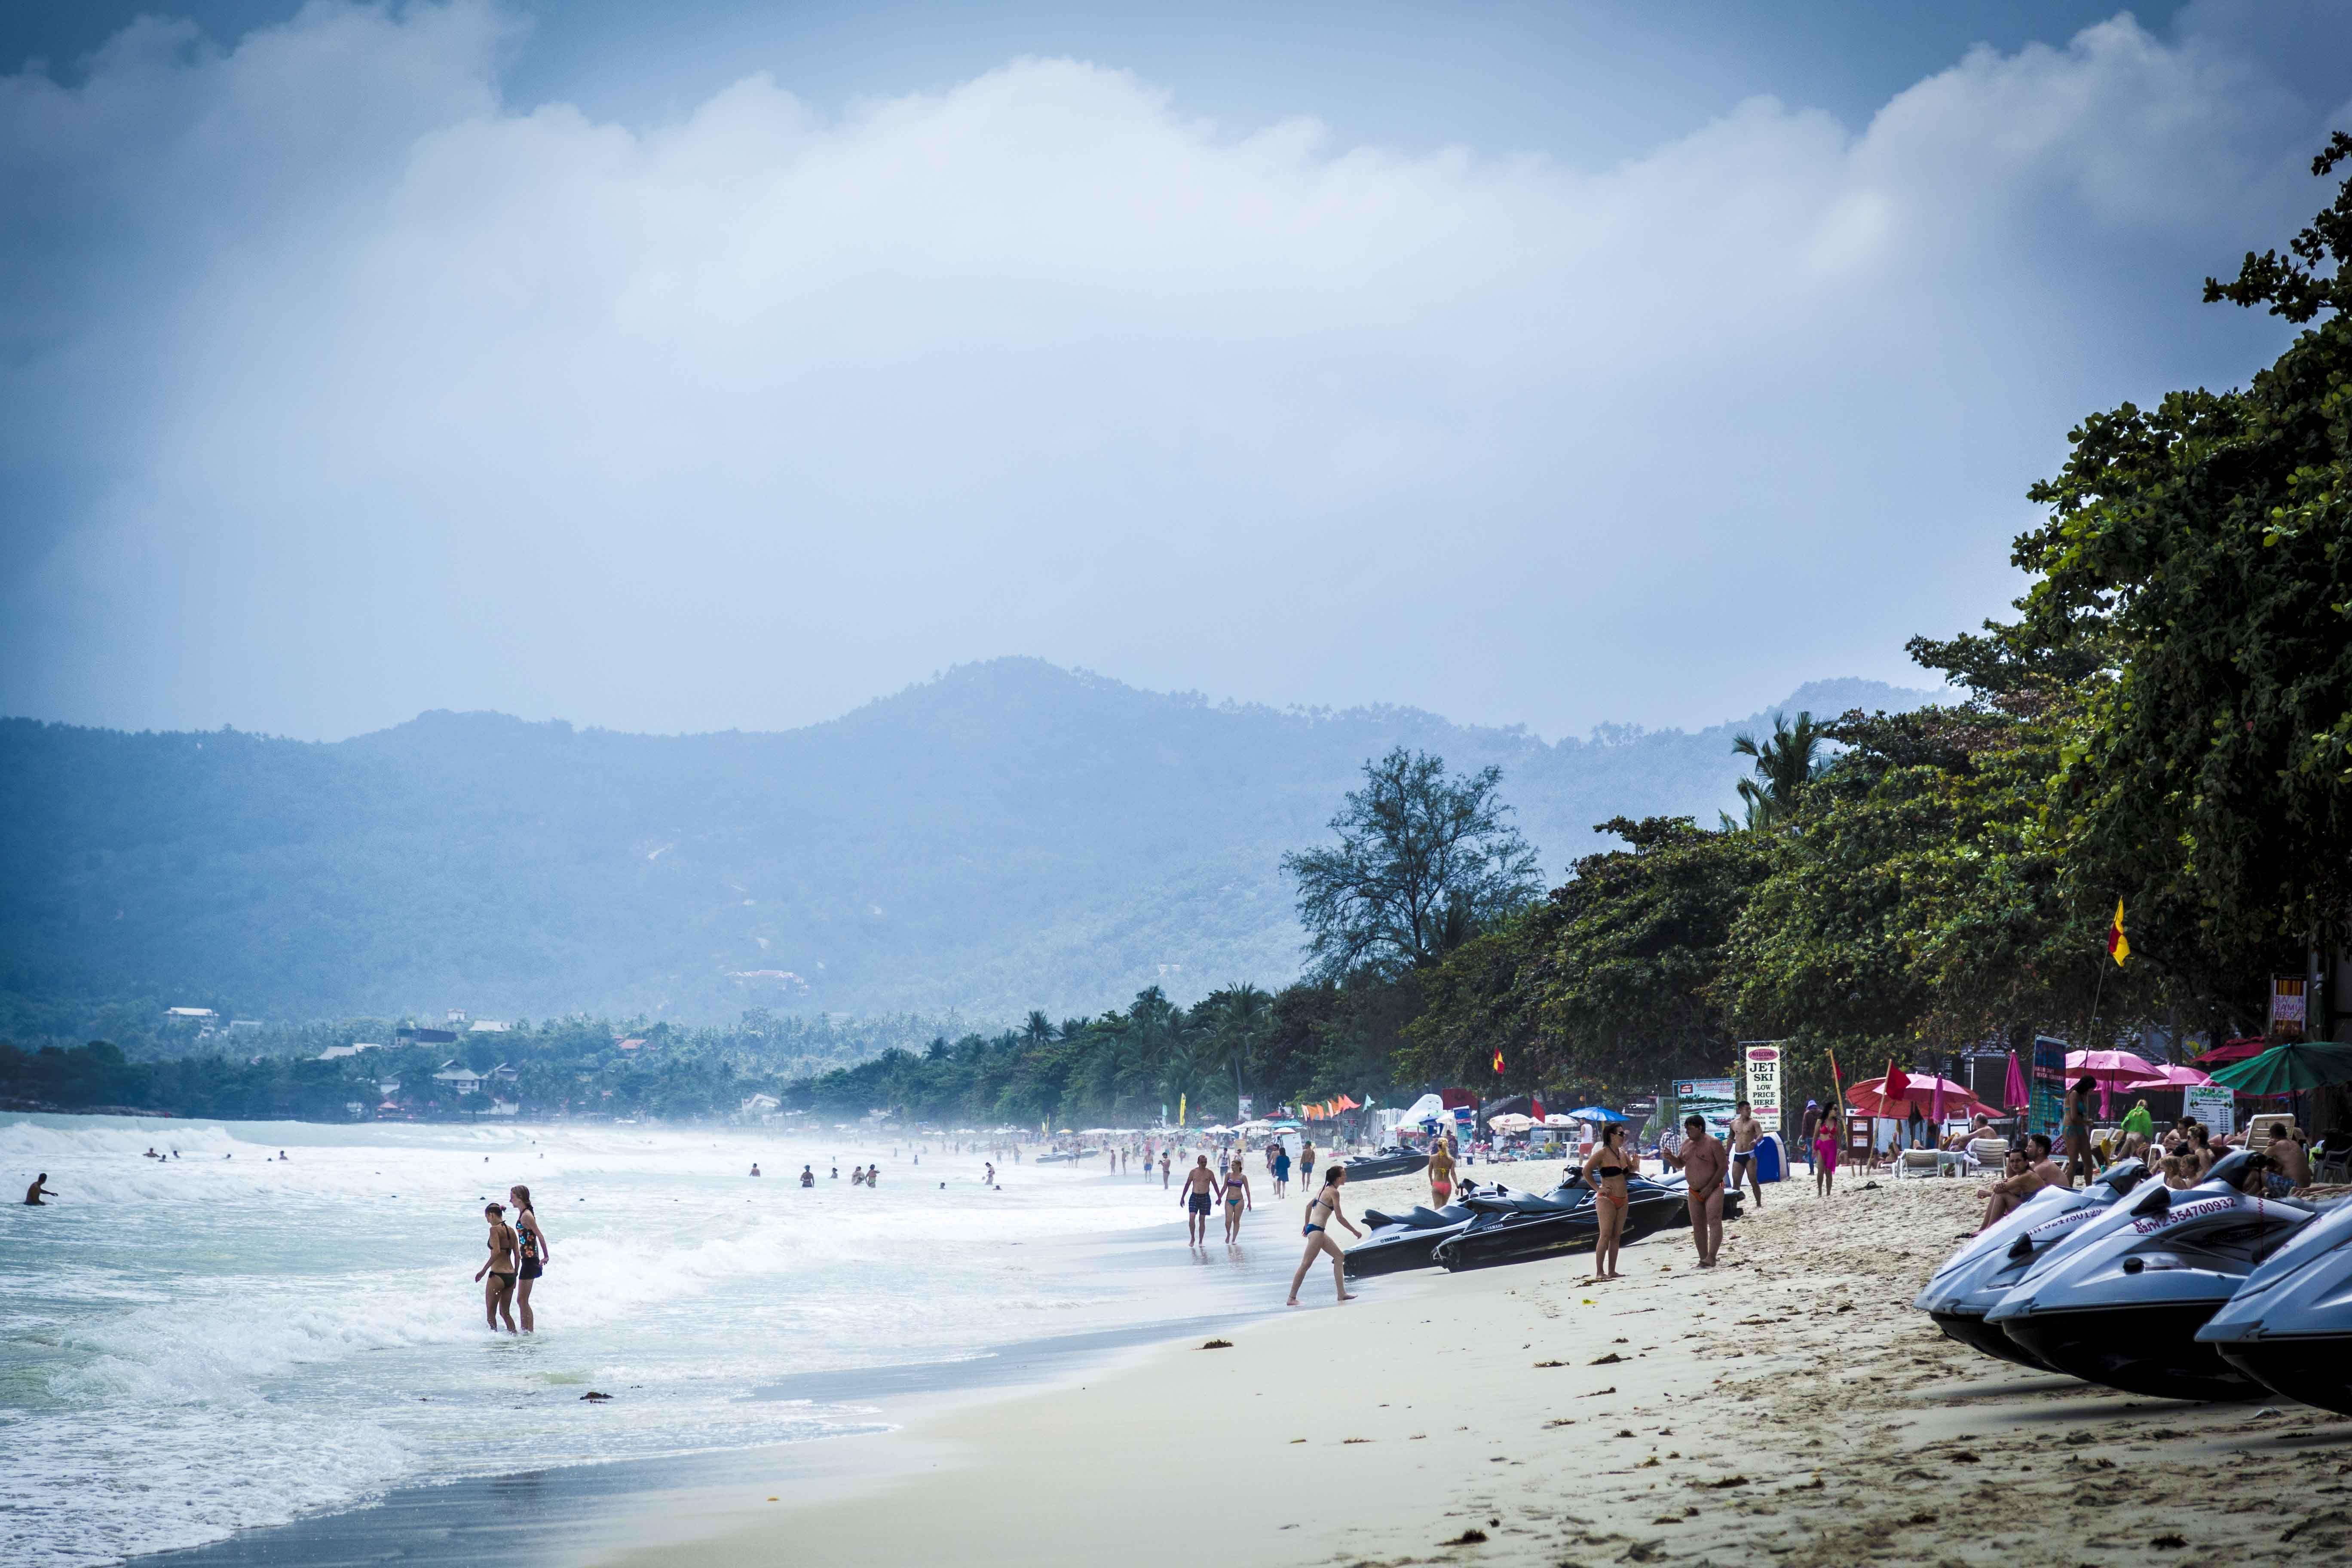 Koh Samui 2014, Chaweng Beach --> Follow us on http://instagram.com/travelloveorg